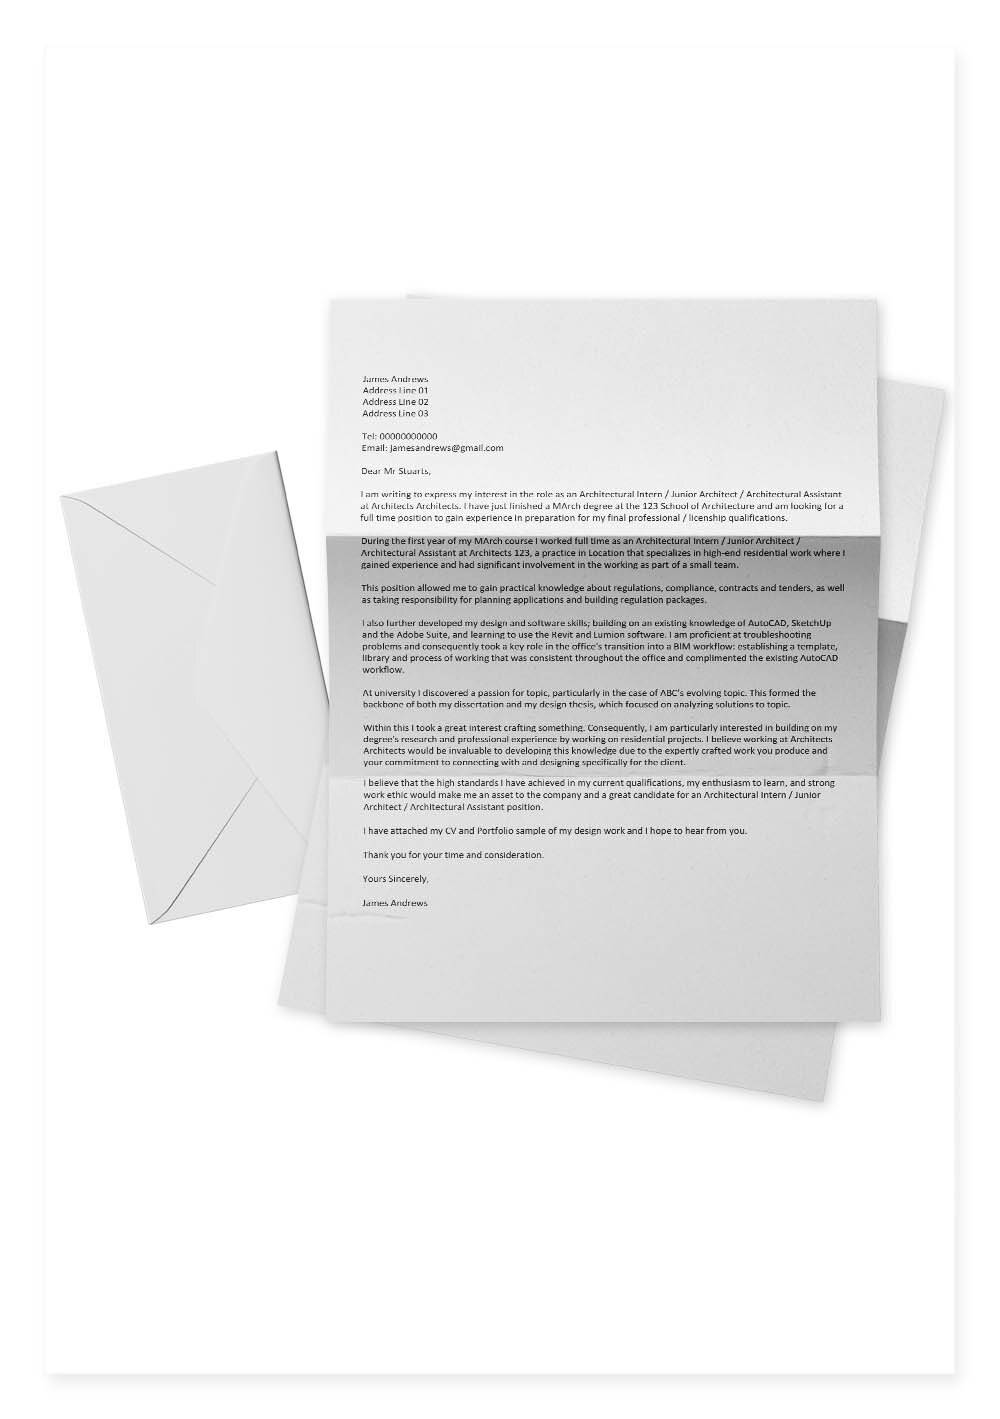 Architecture Cover Letter Templates Archisoup Architecture Guides Resources